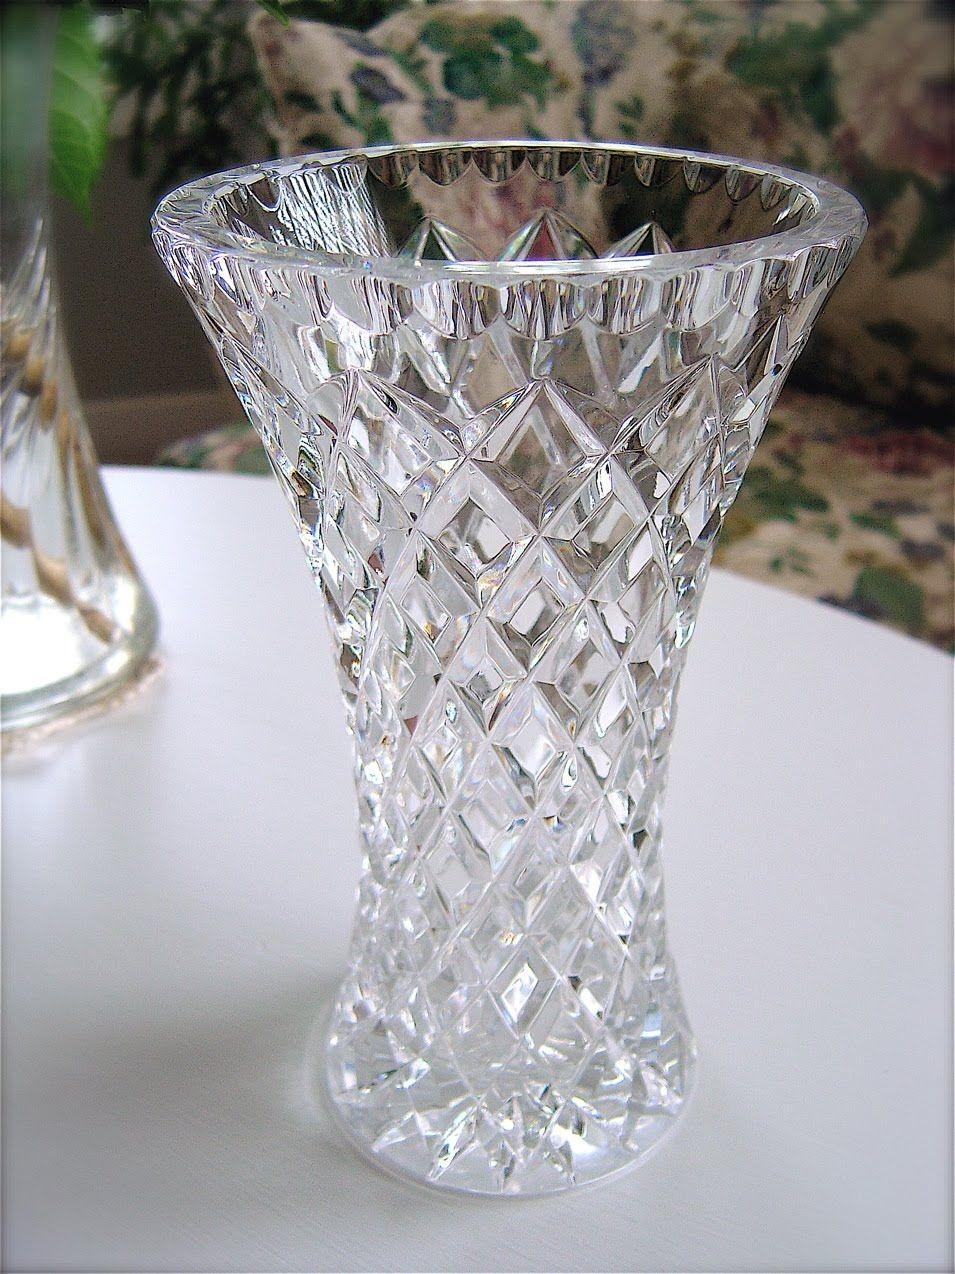 large waterford crystal vase of crystal vases for sale vase pinterest crystal vase and crystals throughout 74547ff5034c00424f36cfbda4cb6c74